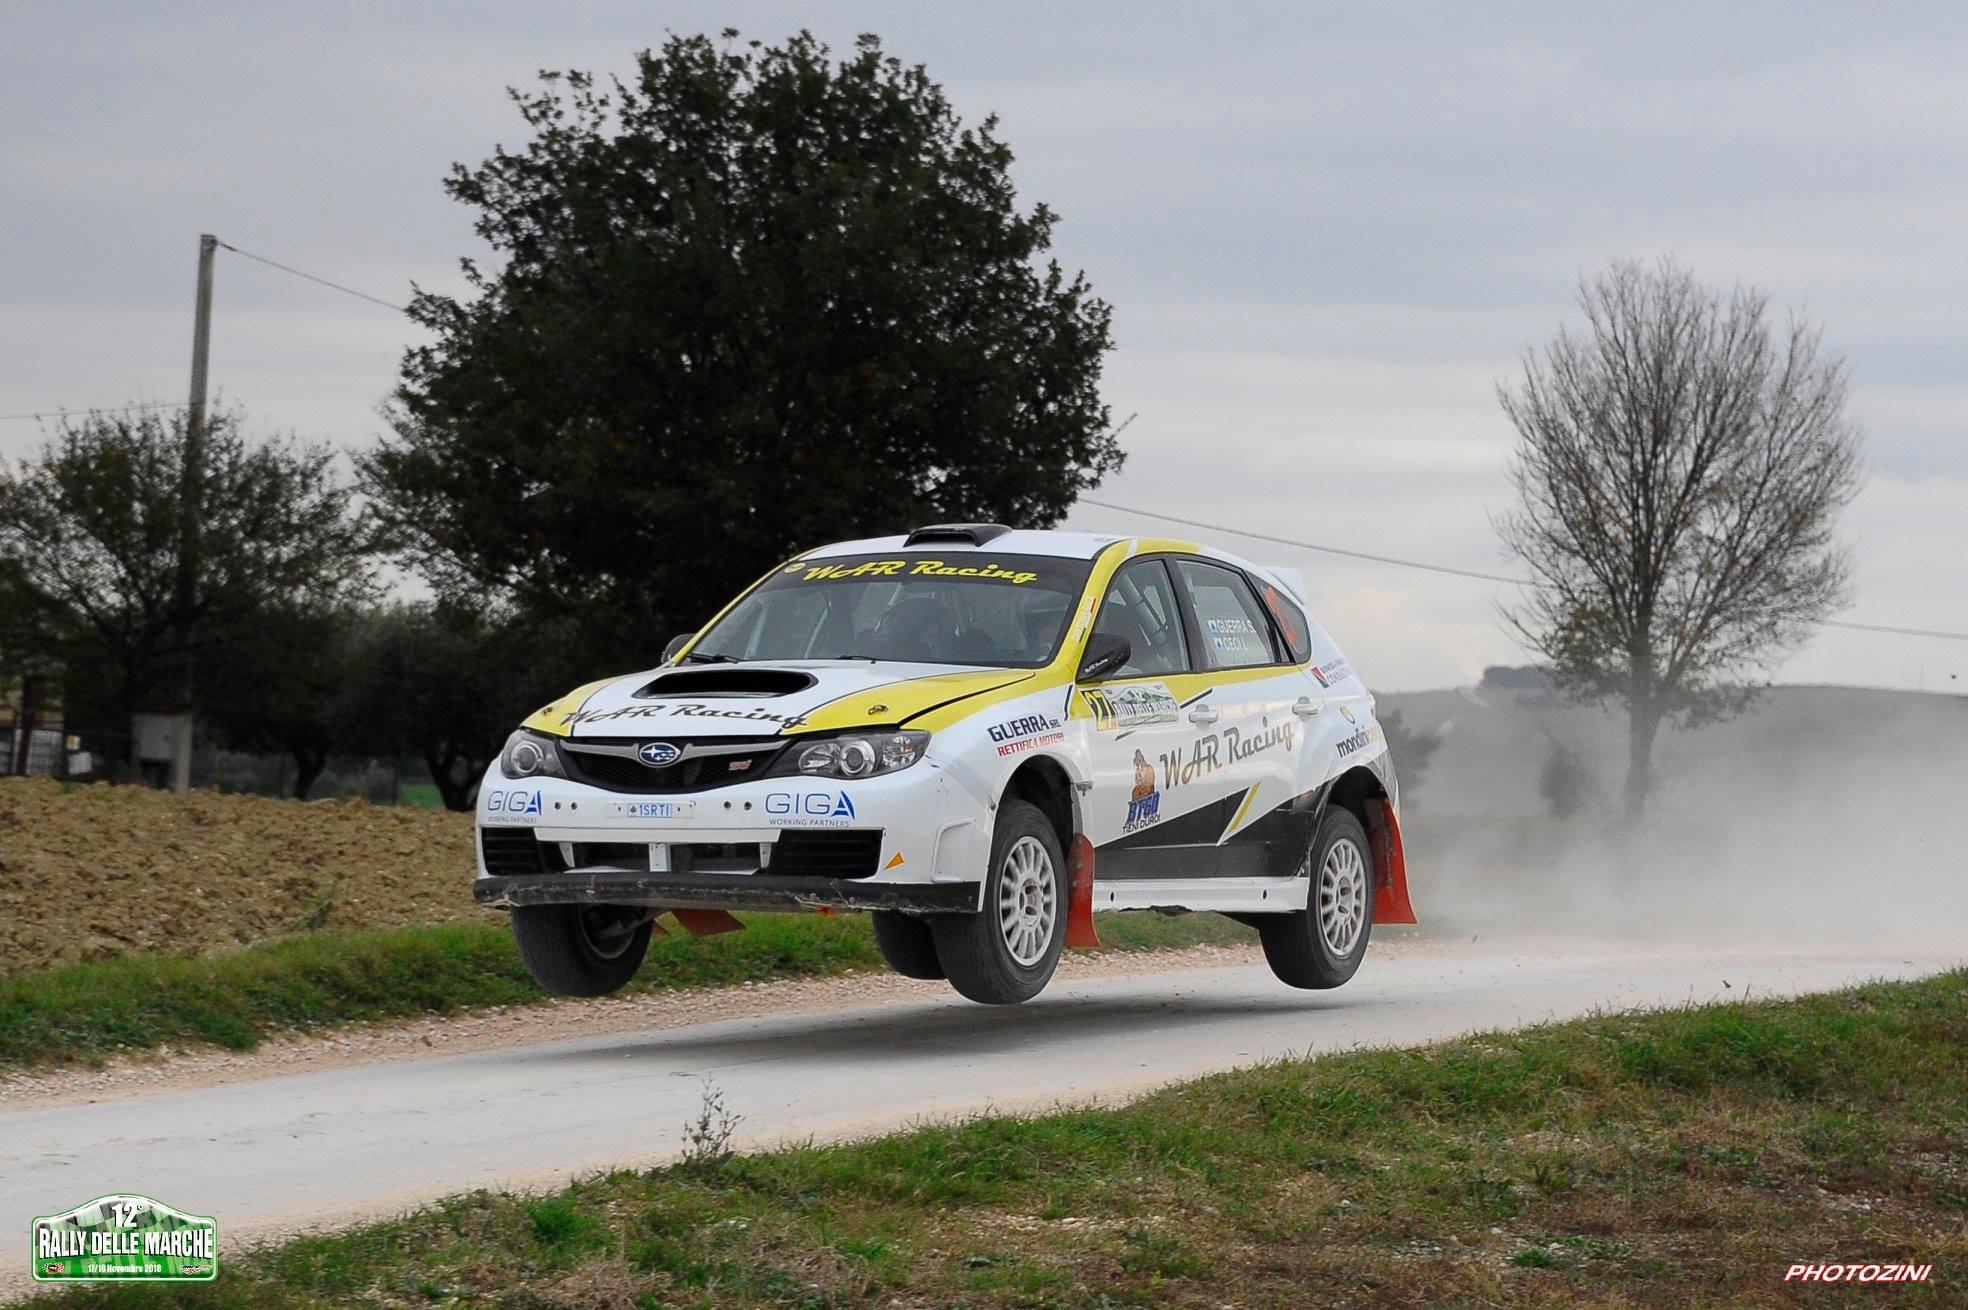 Splendida vittoria per la War Racing di San Marino